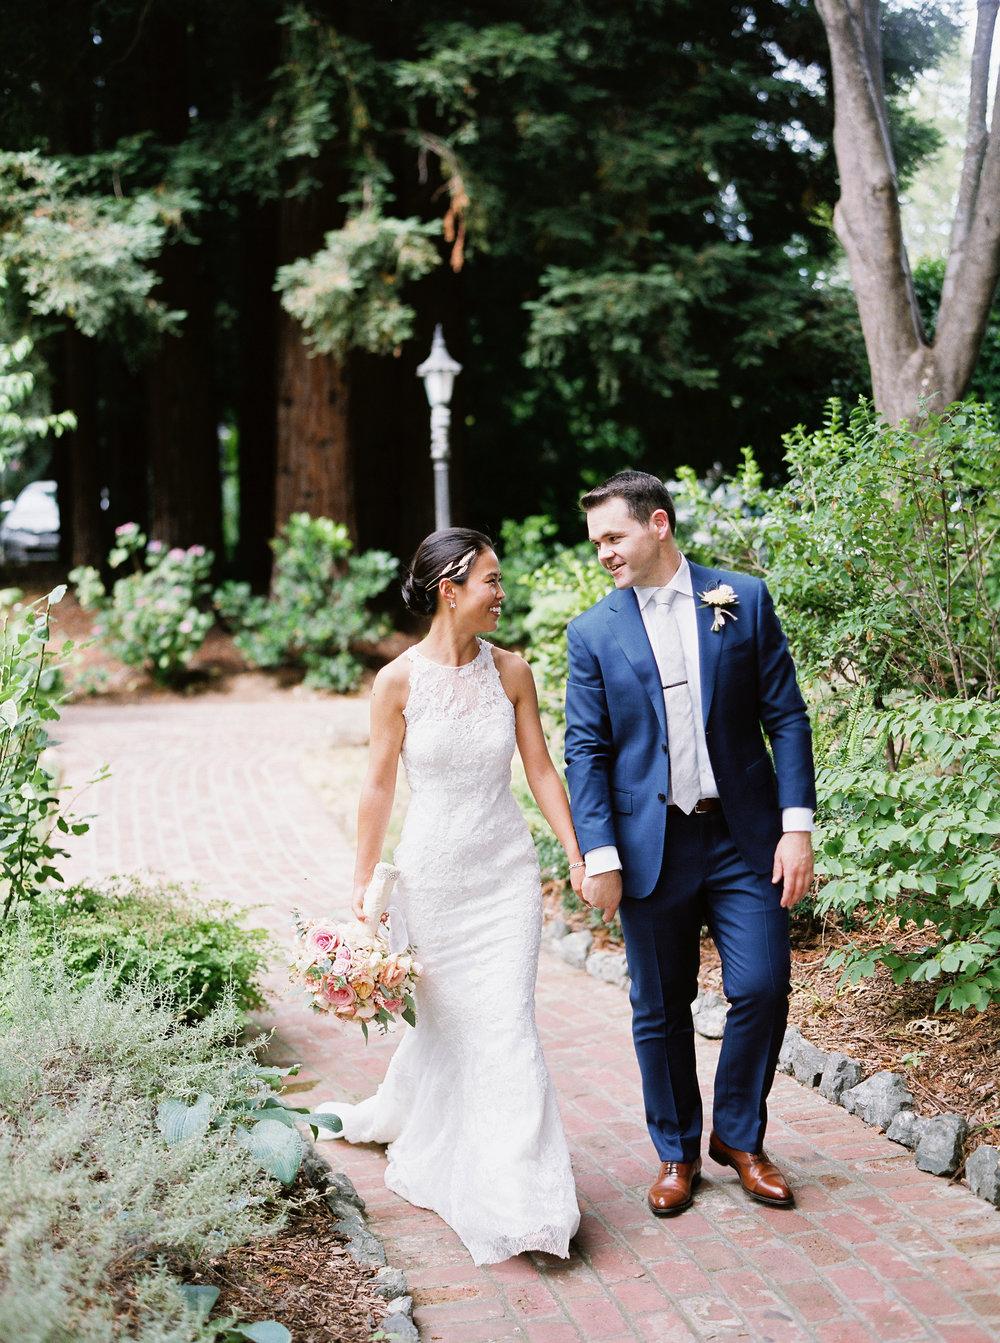 Harvest-inn-wedding-in-napa-california-215.jpg